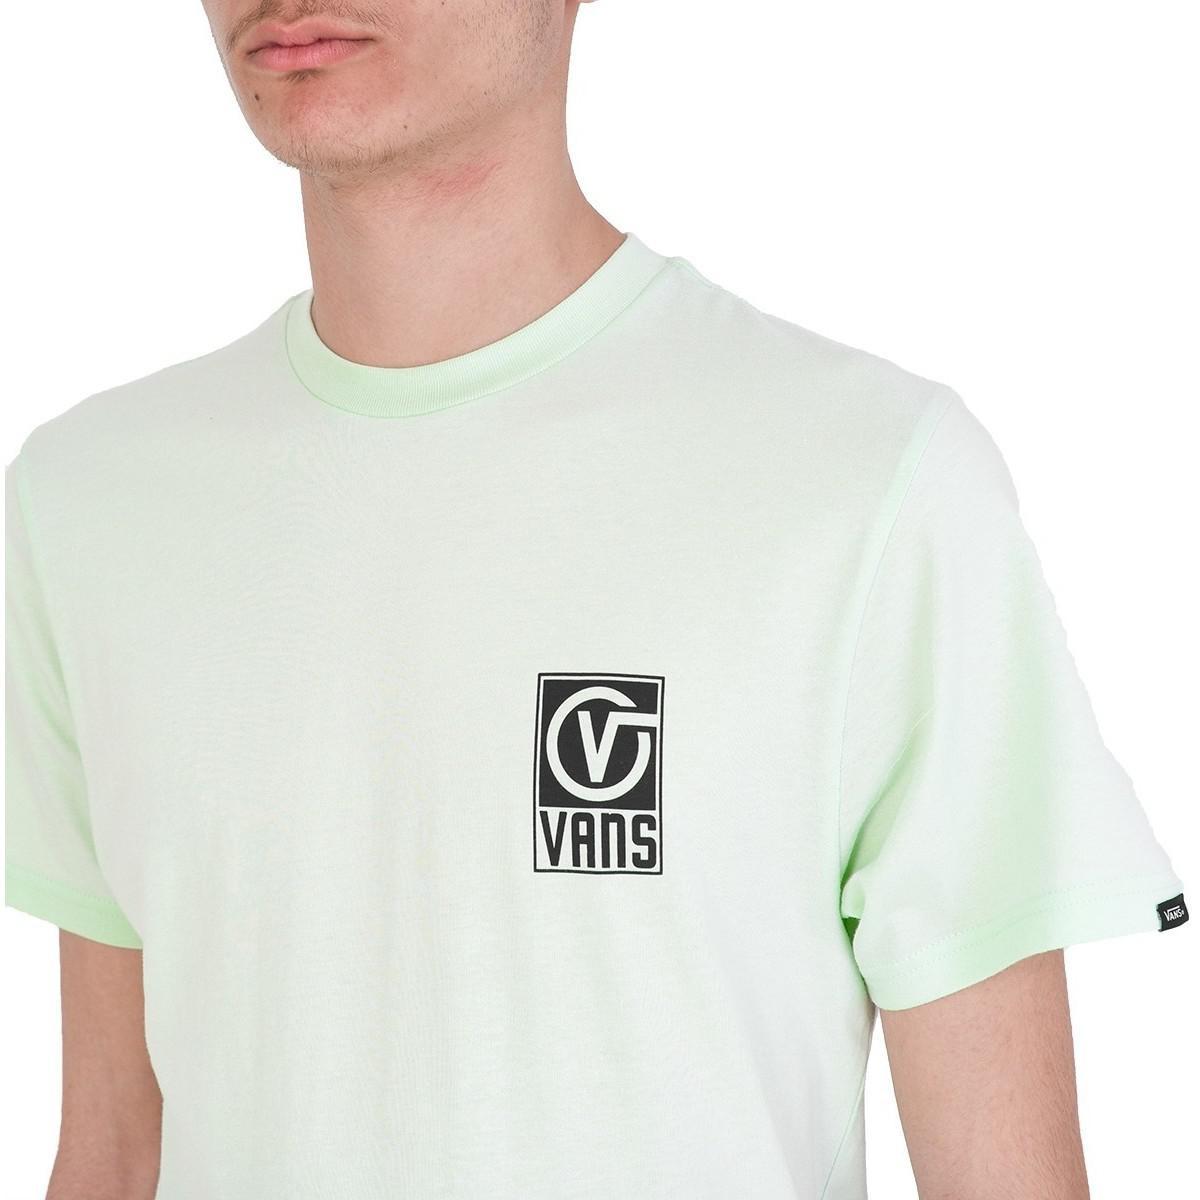 06f04ce0dd6e8a Vans Ha9p0n Worldwide Tshirt Men s T Shirt In Green in Green for Men ...